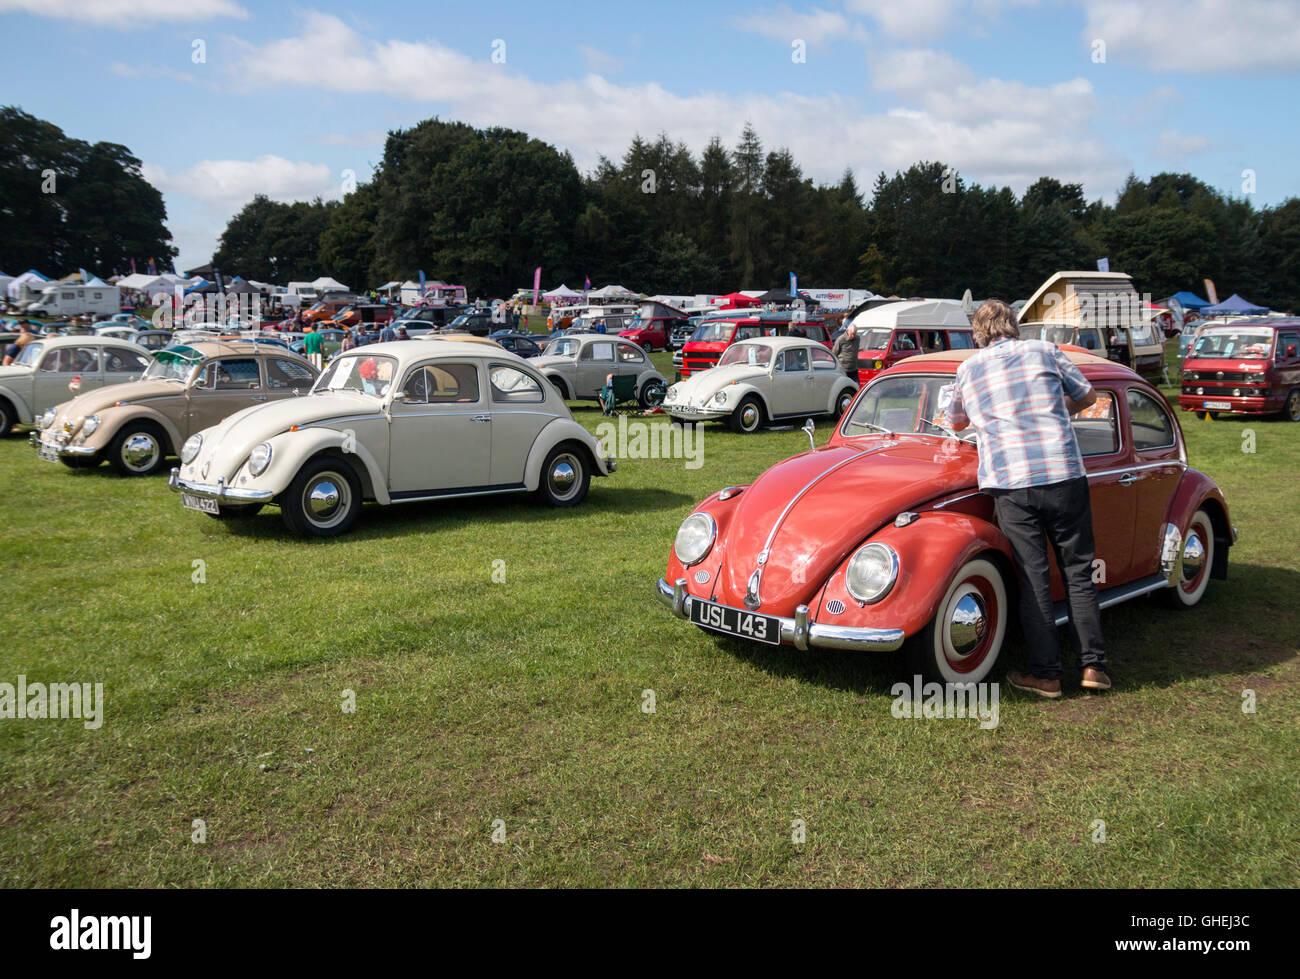 Tatton Park Vw Car Show